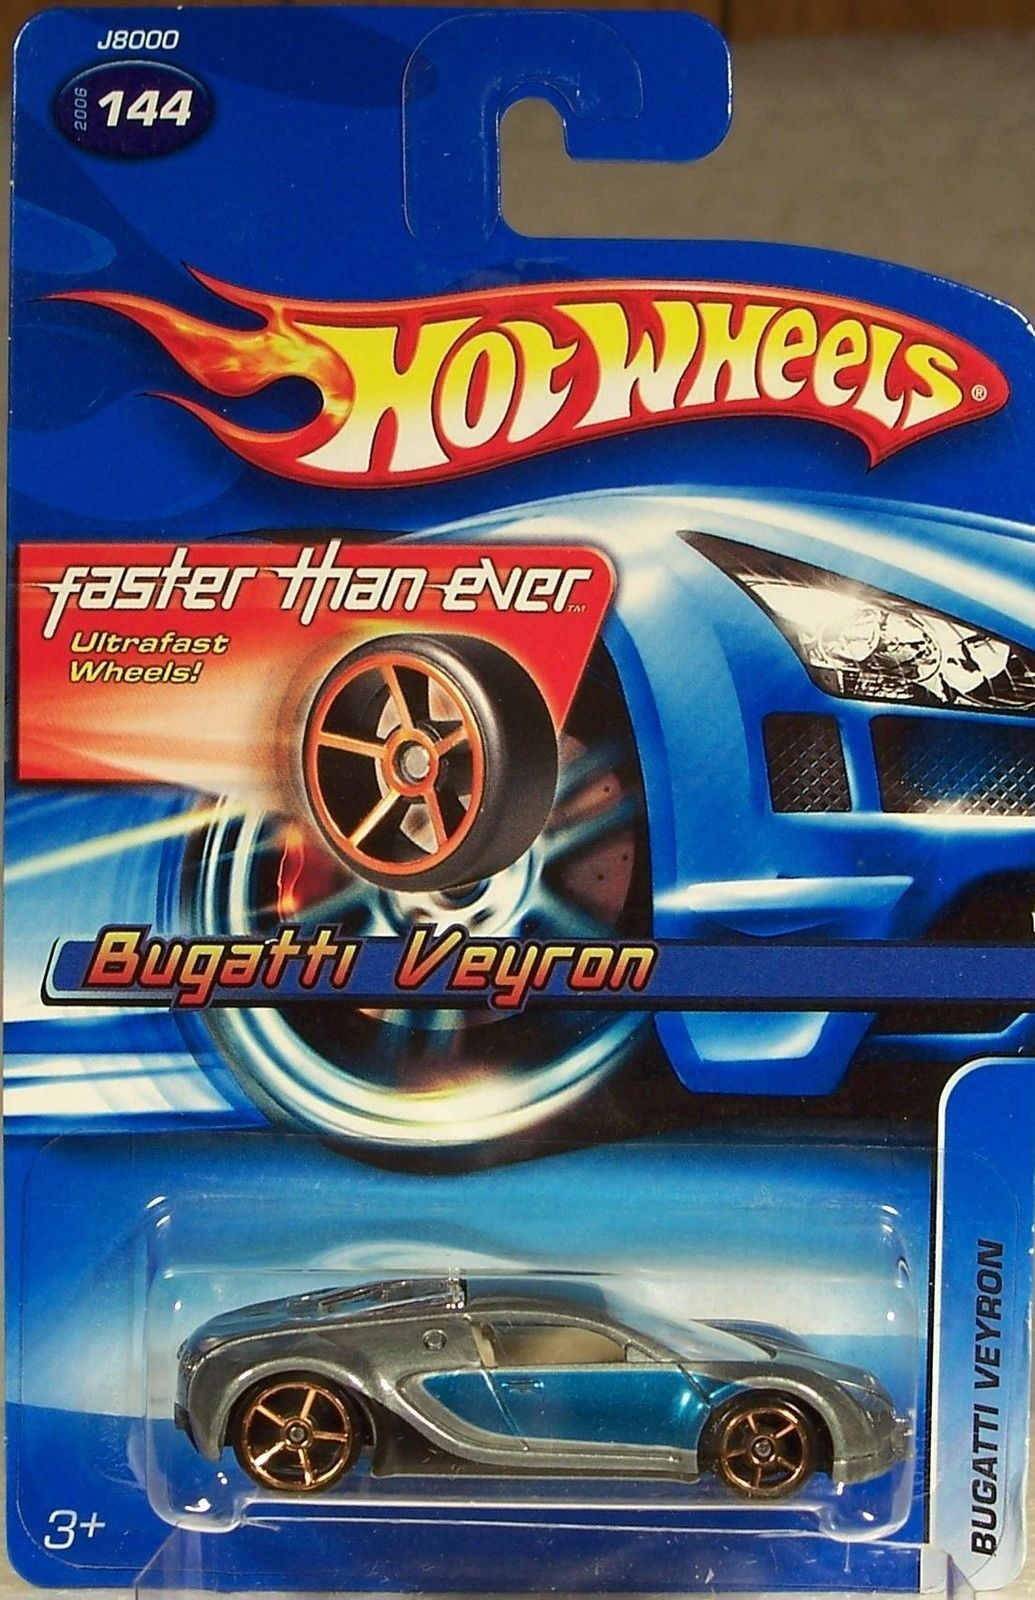 2006 Hot Wheels Faster Than Ever Bugatti Veyron Hot Wheels Hot Wheels Treasure Hunt Veyron